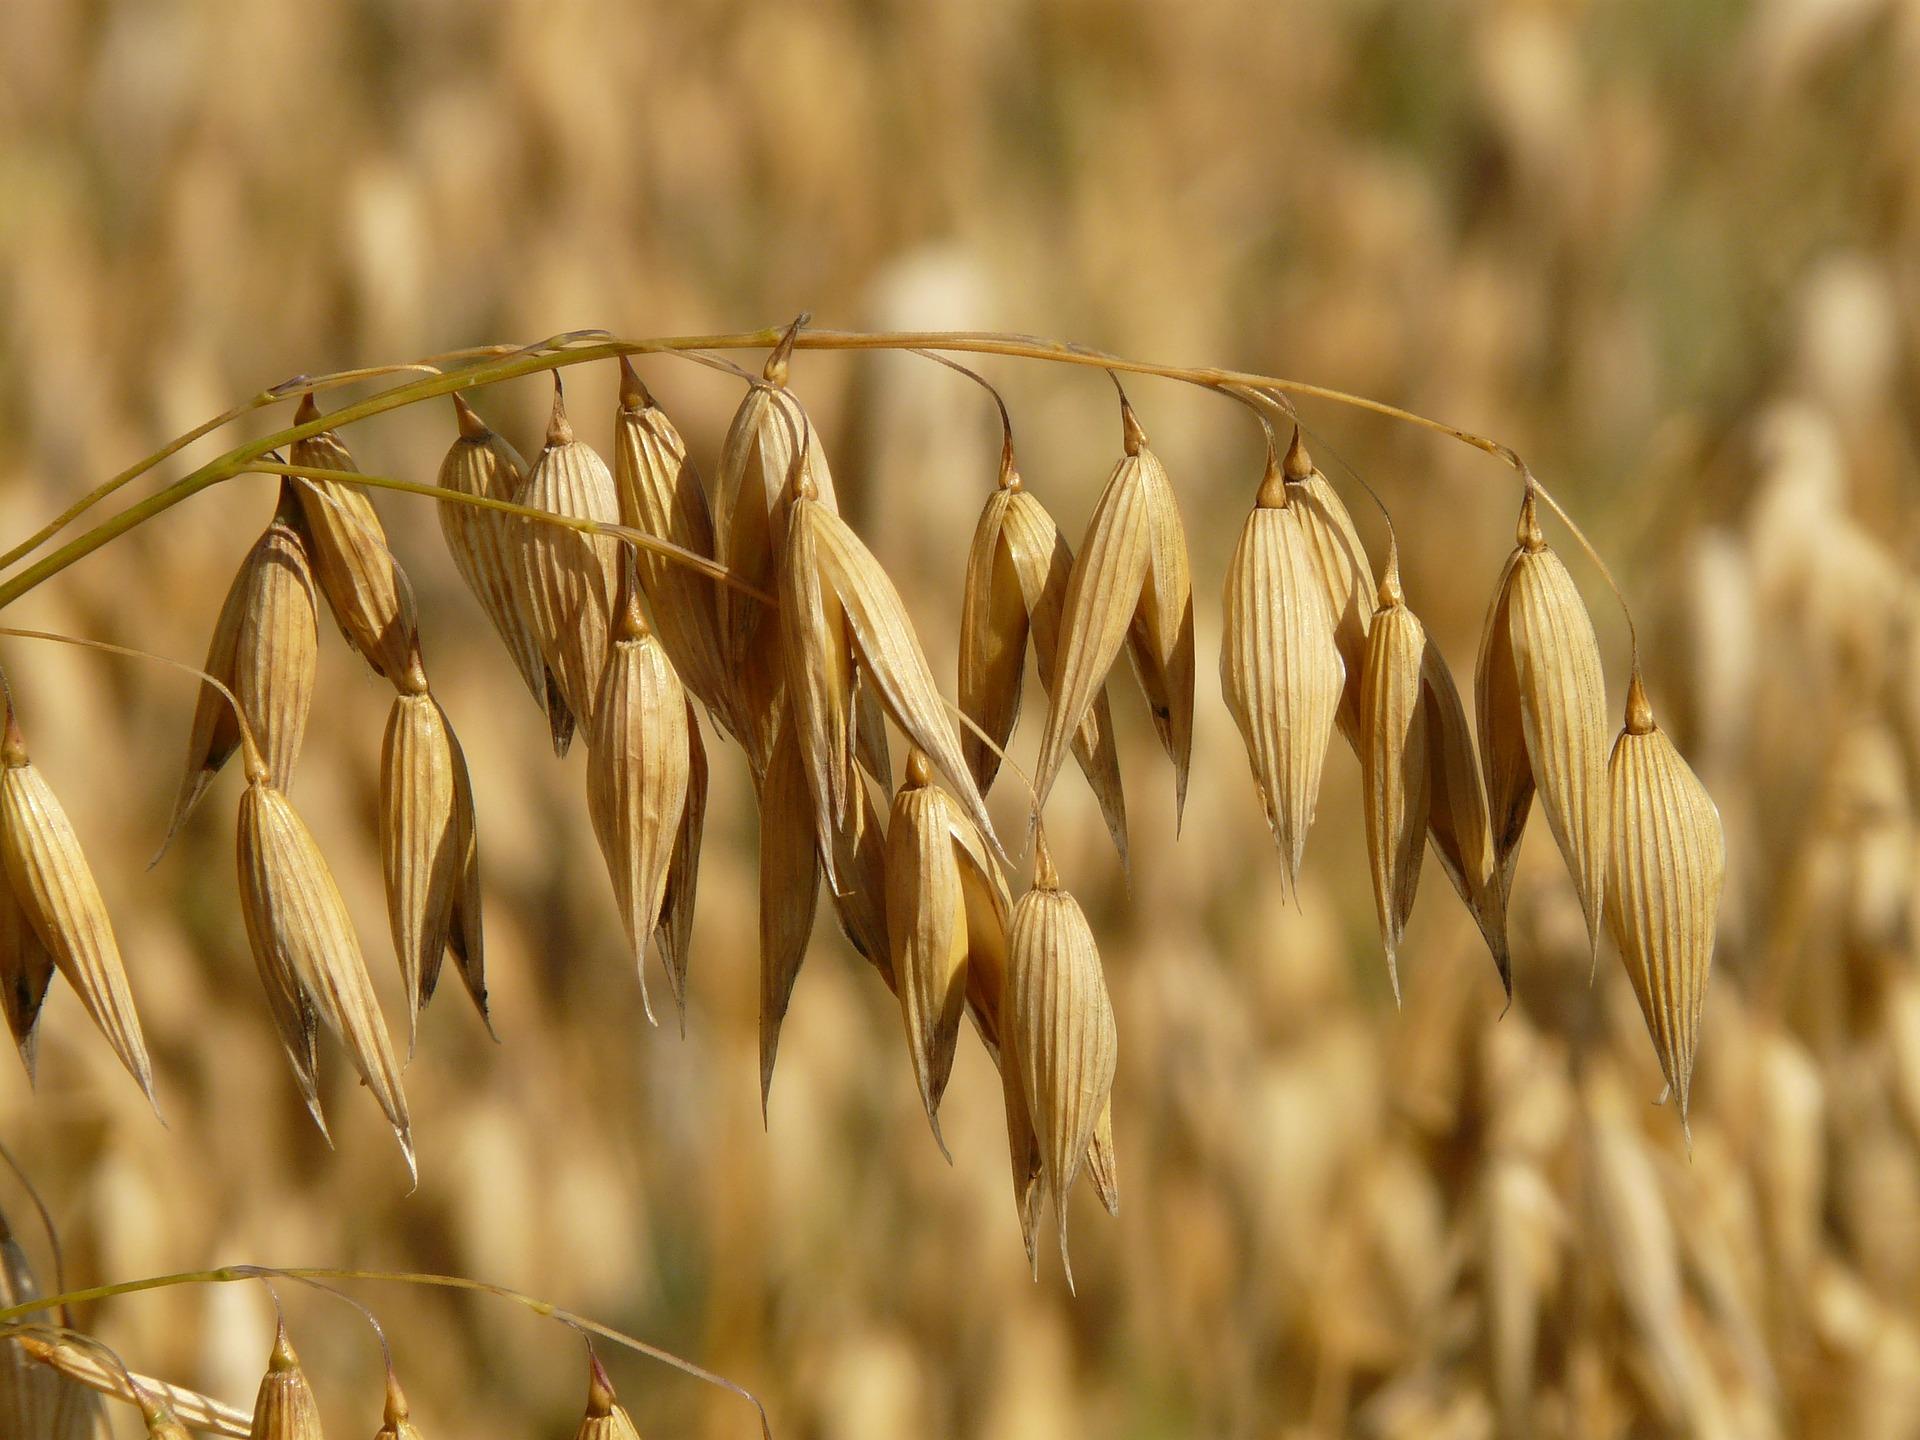 oats-8946_1920.jpg